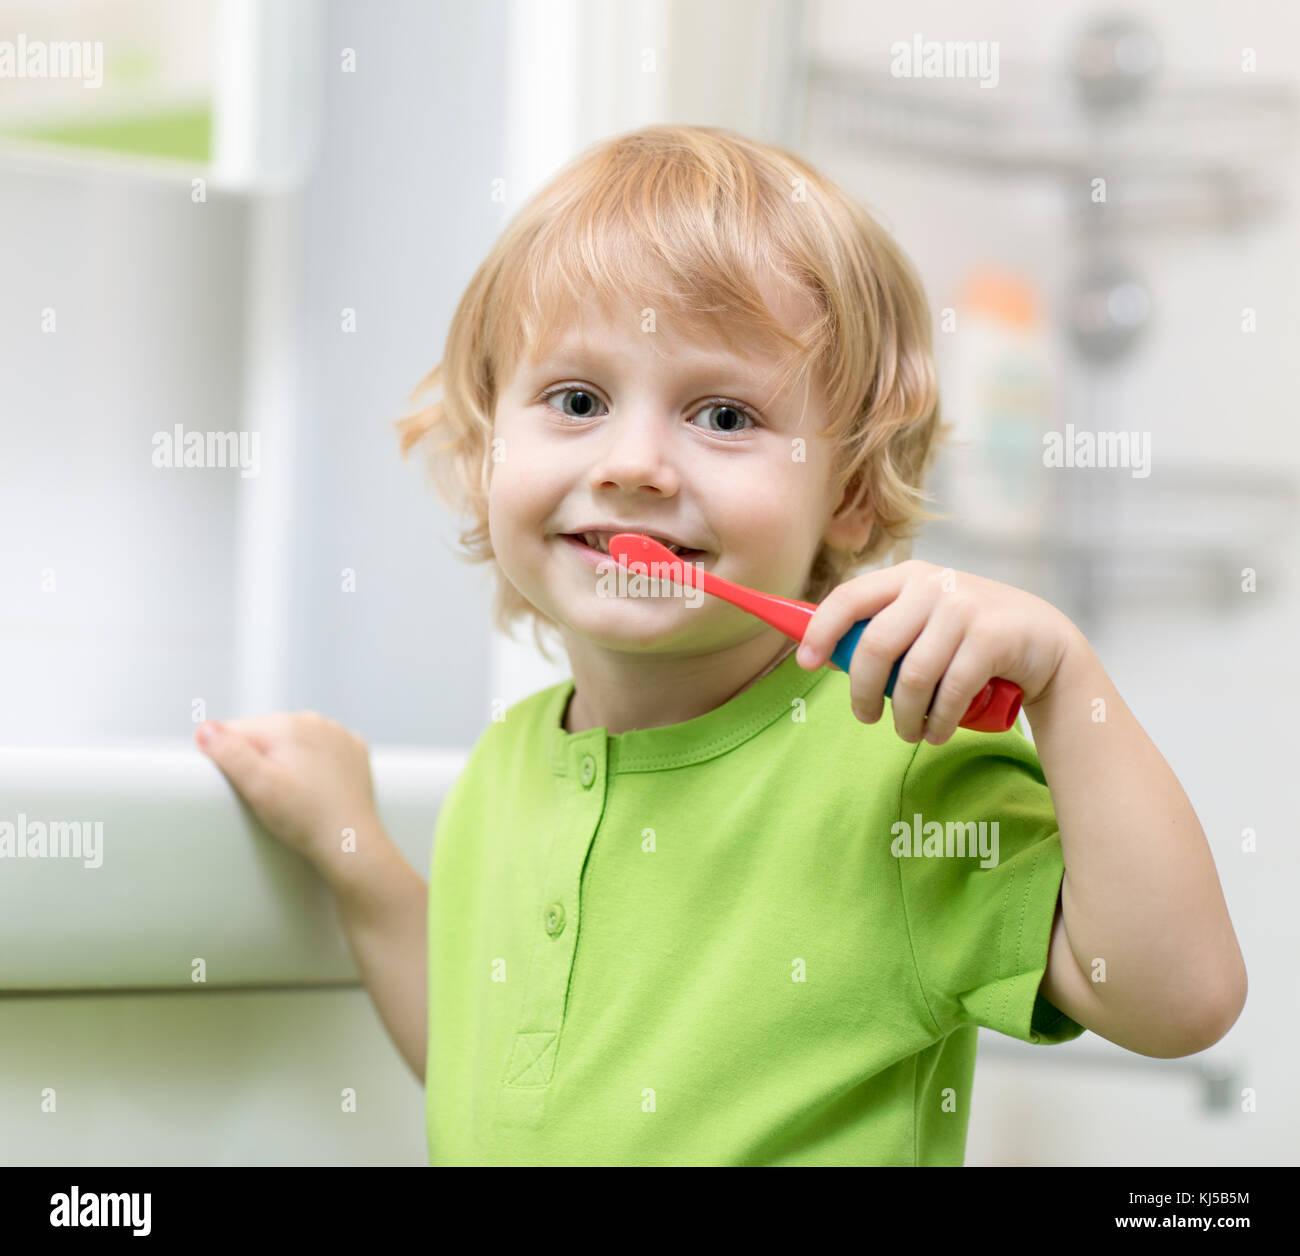 Little boy brushing his teeth in bathroom - Stock Image